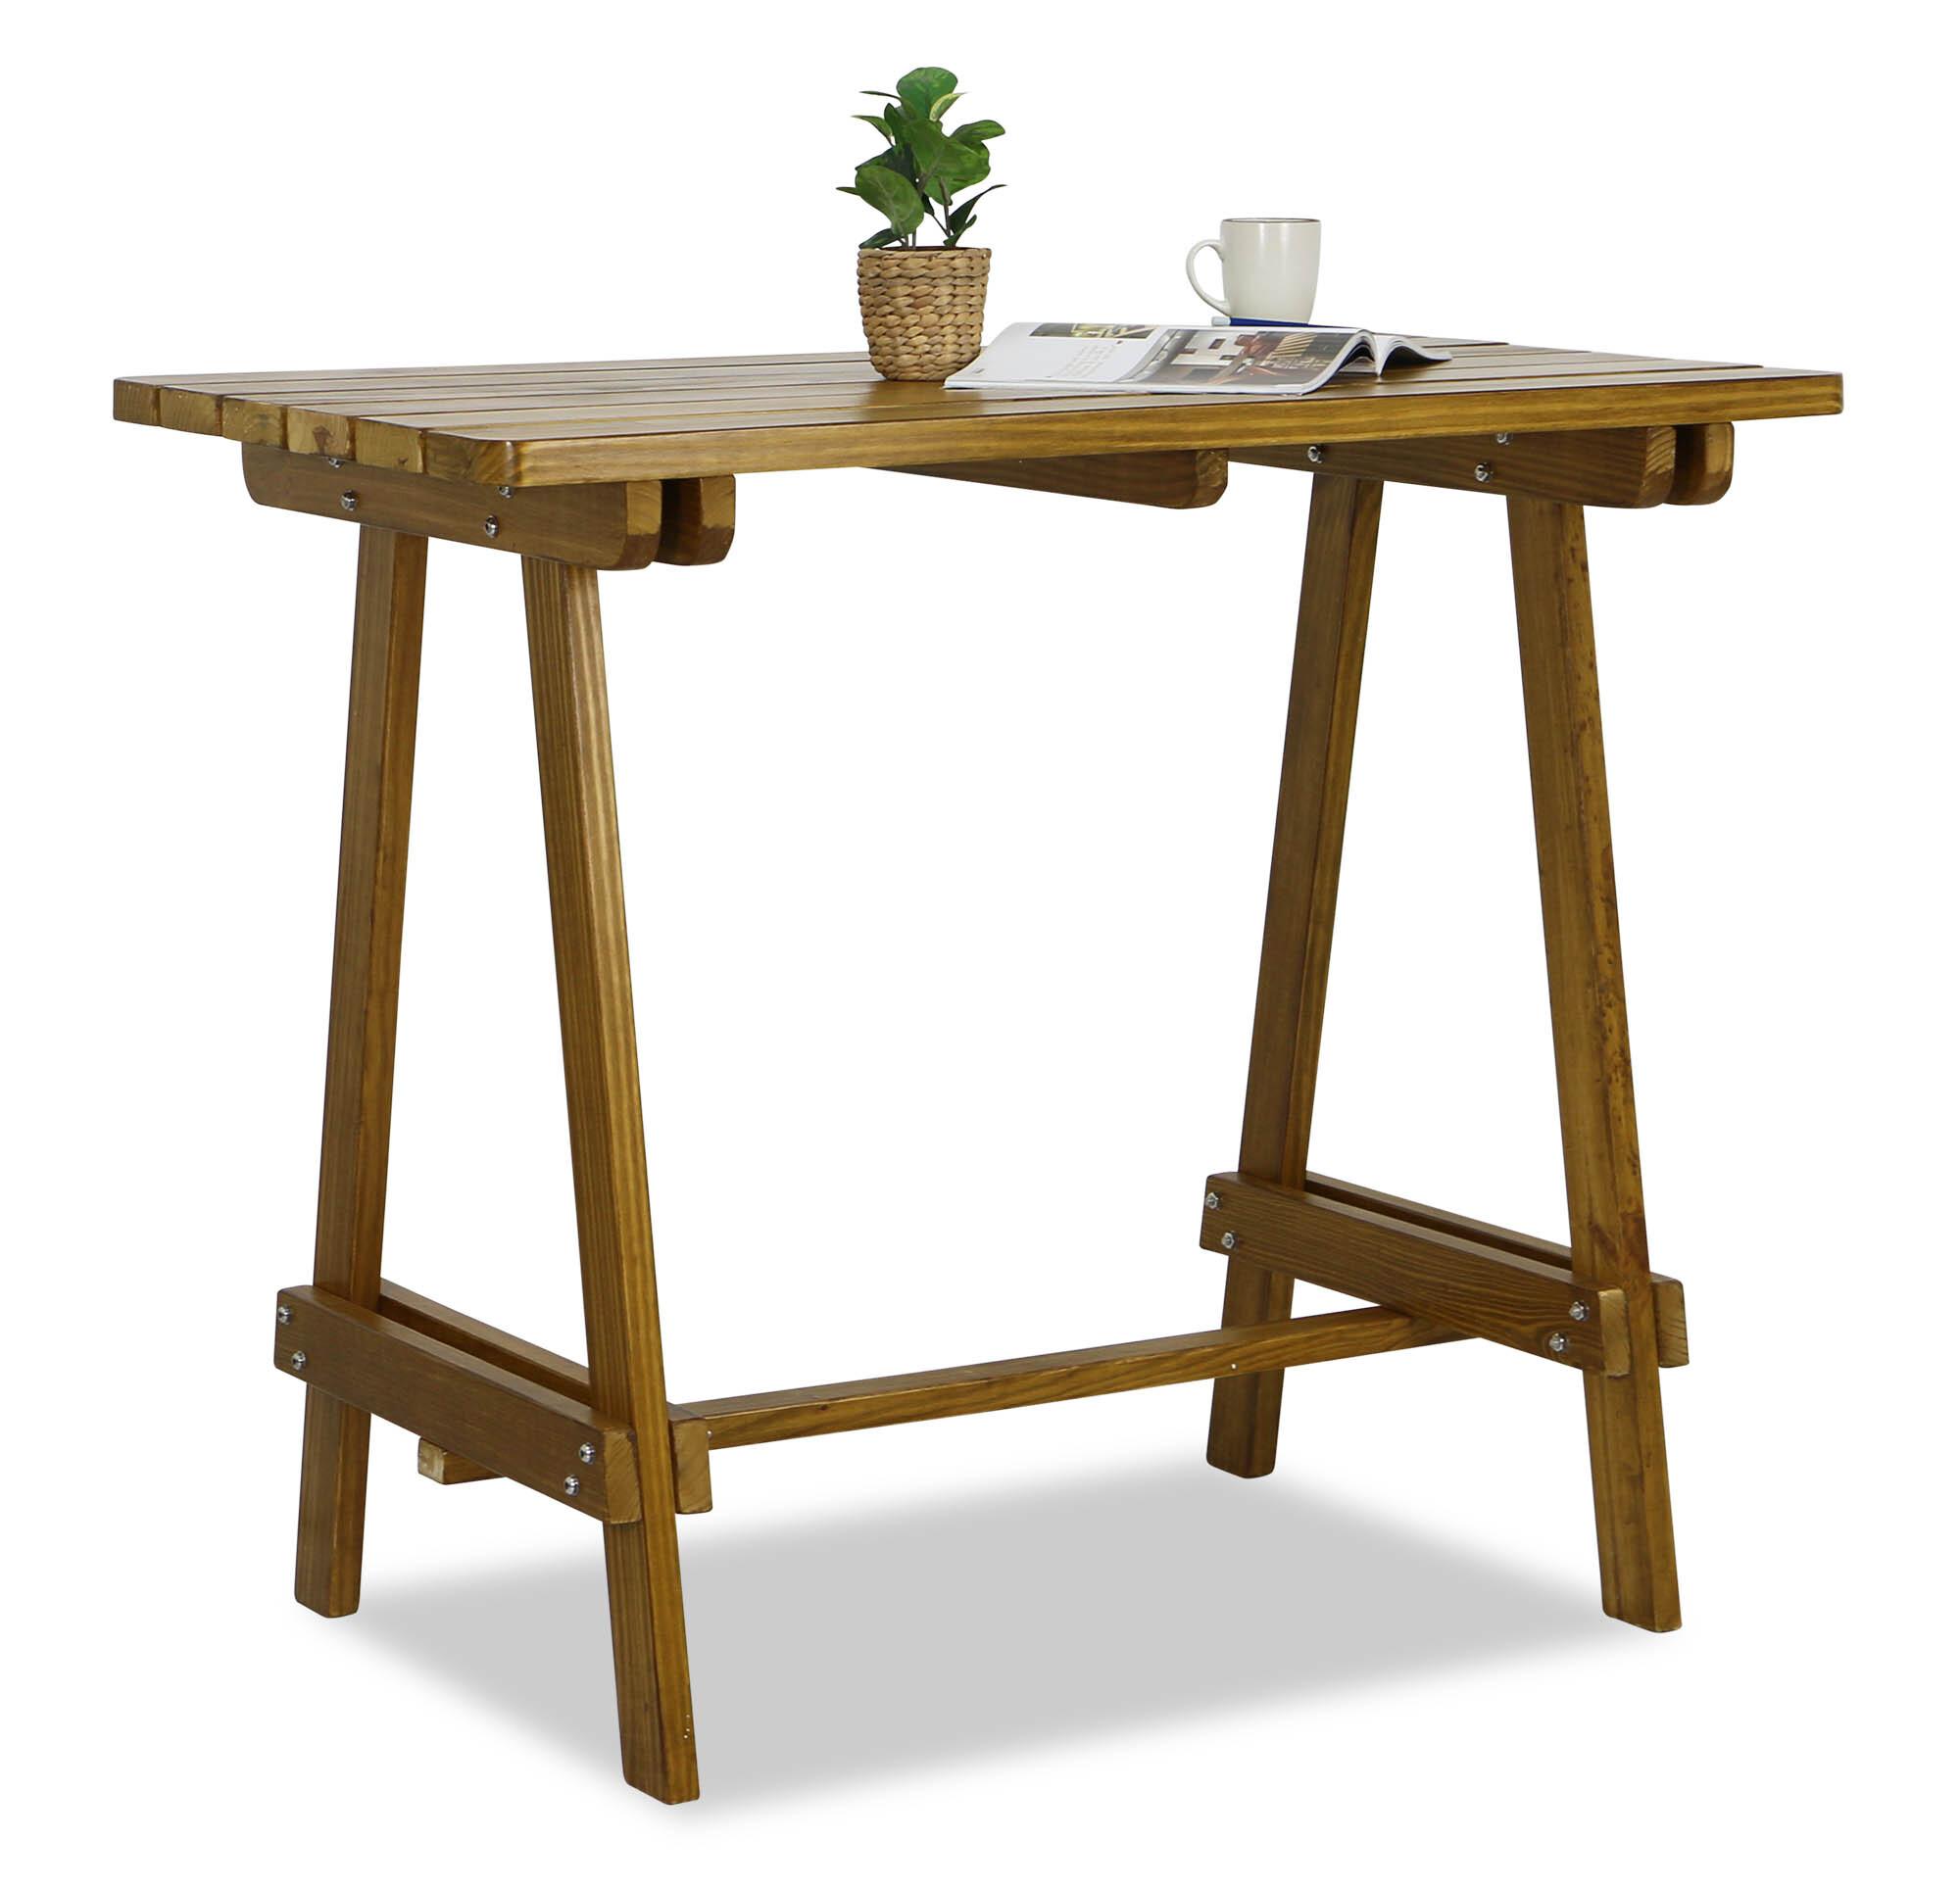 apache wooden bar table - Wooden Bar Table